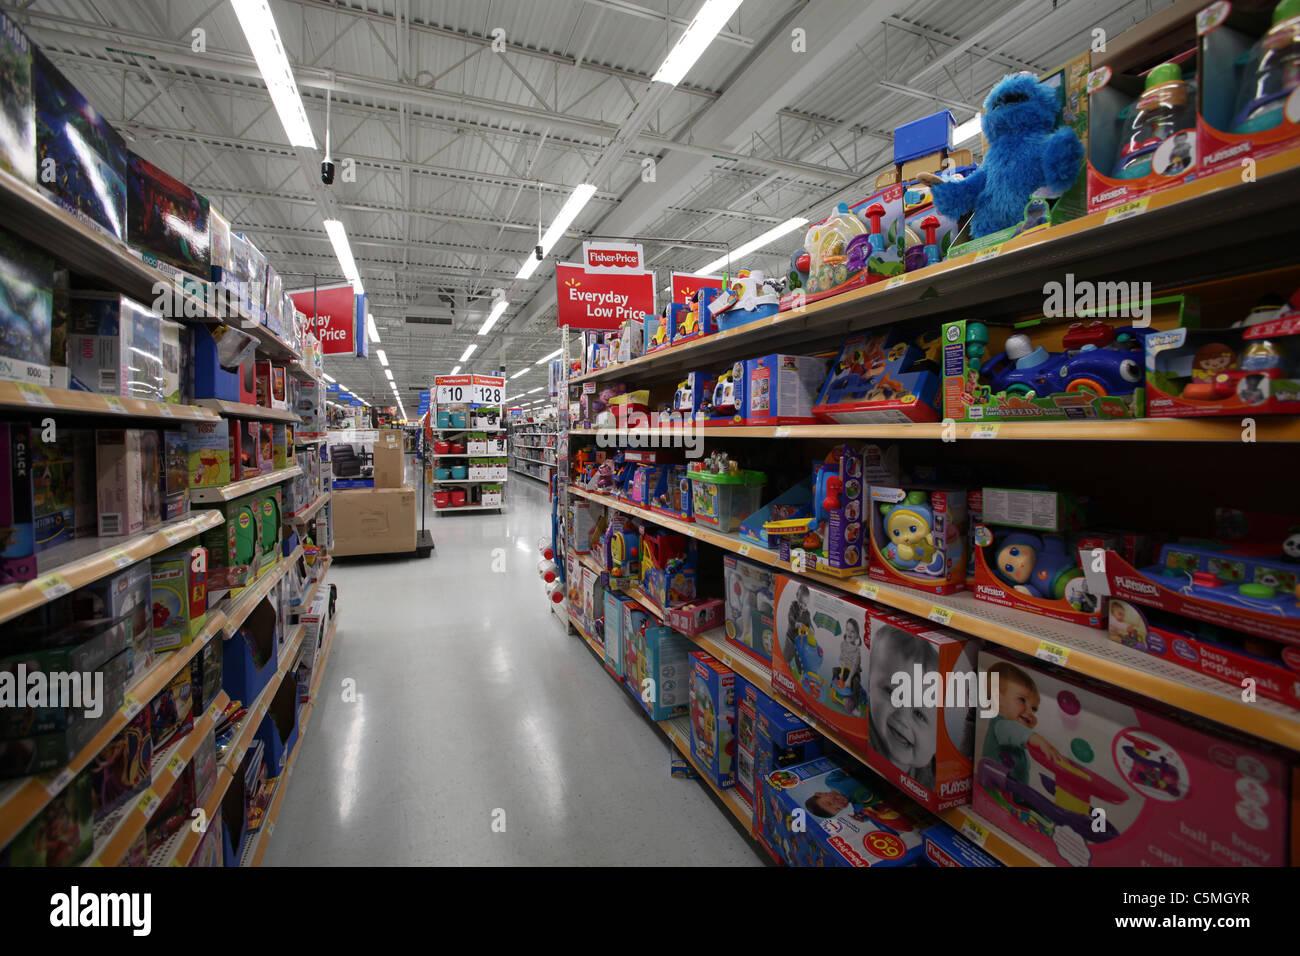 Walmart Supercentre Stock Photos & Walmart Supercentre ...